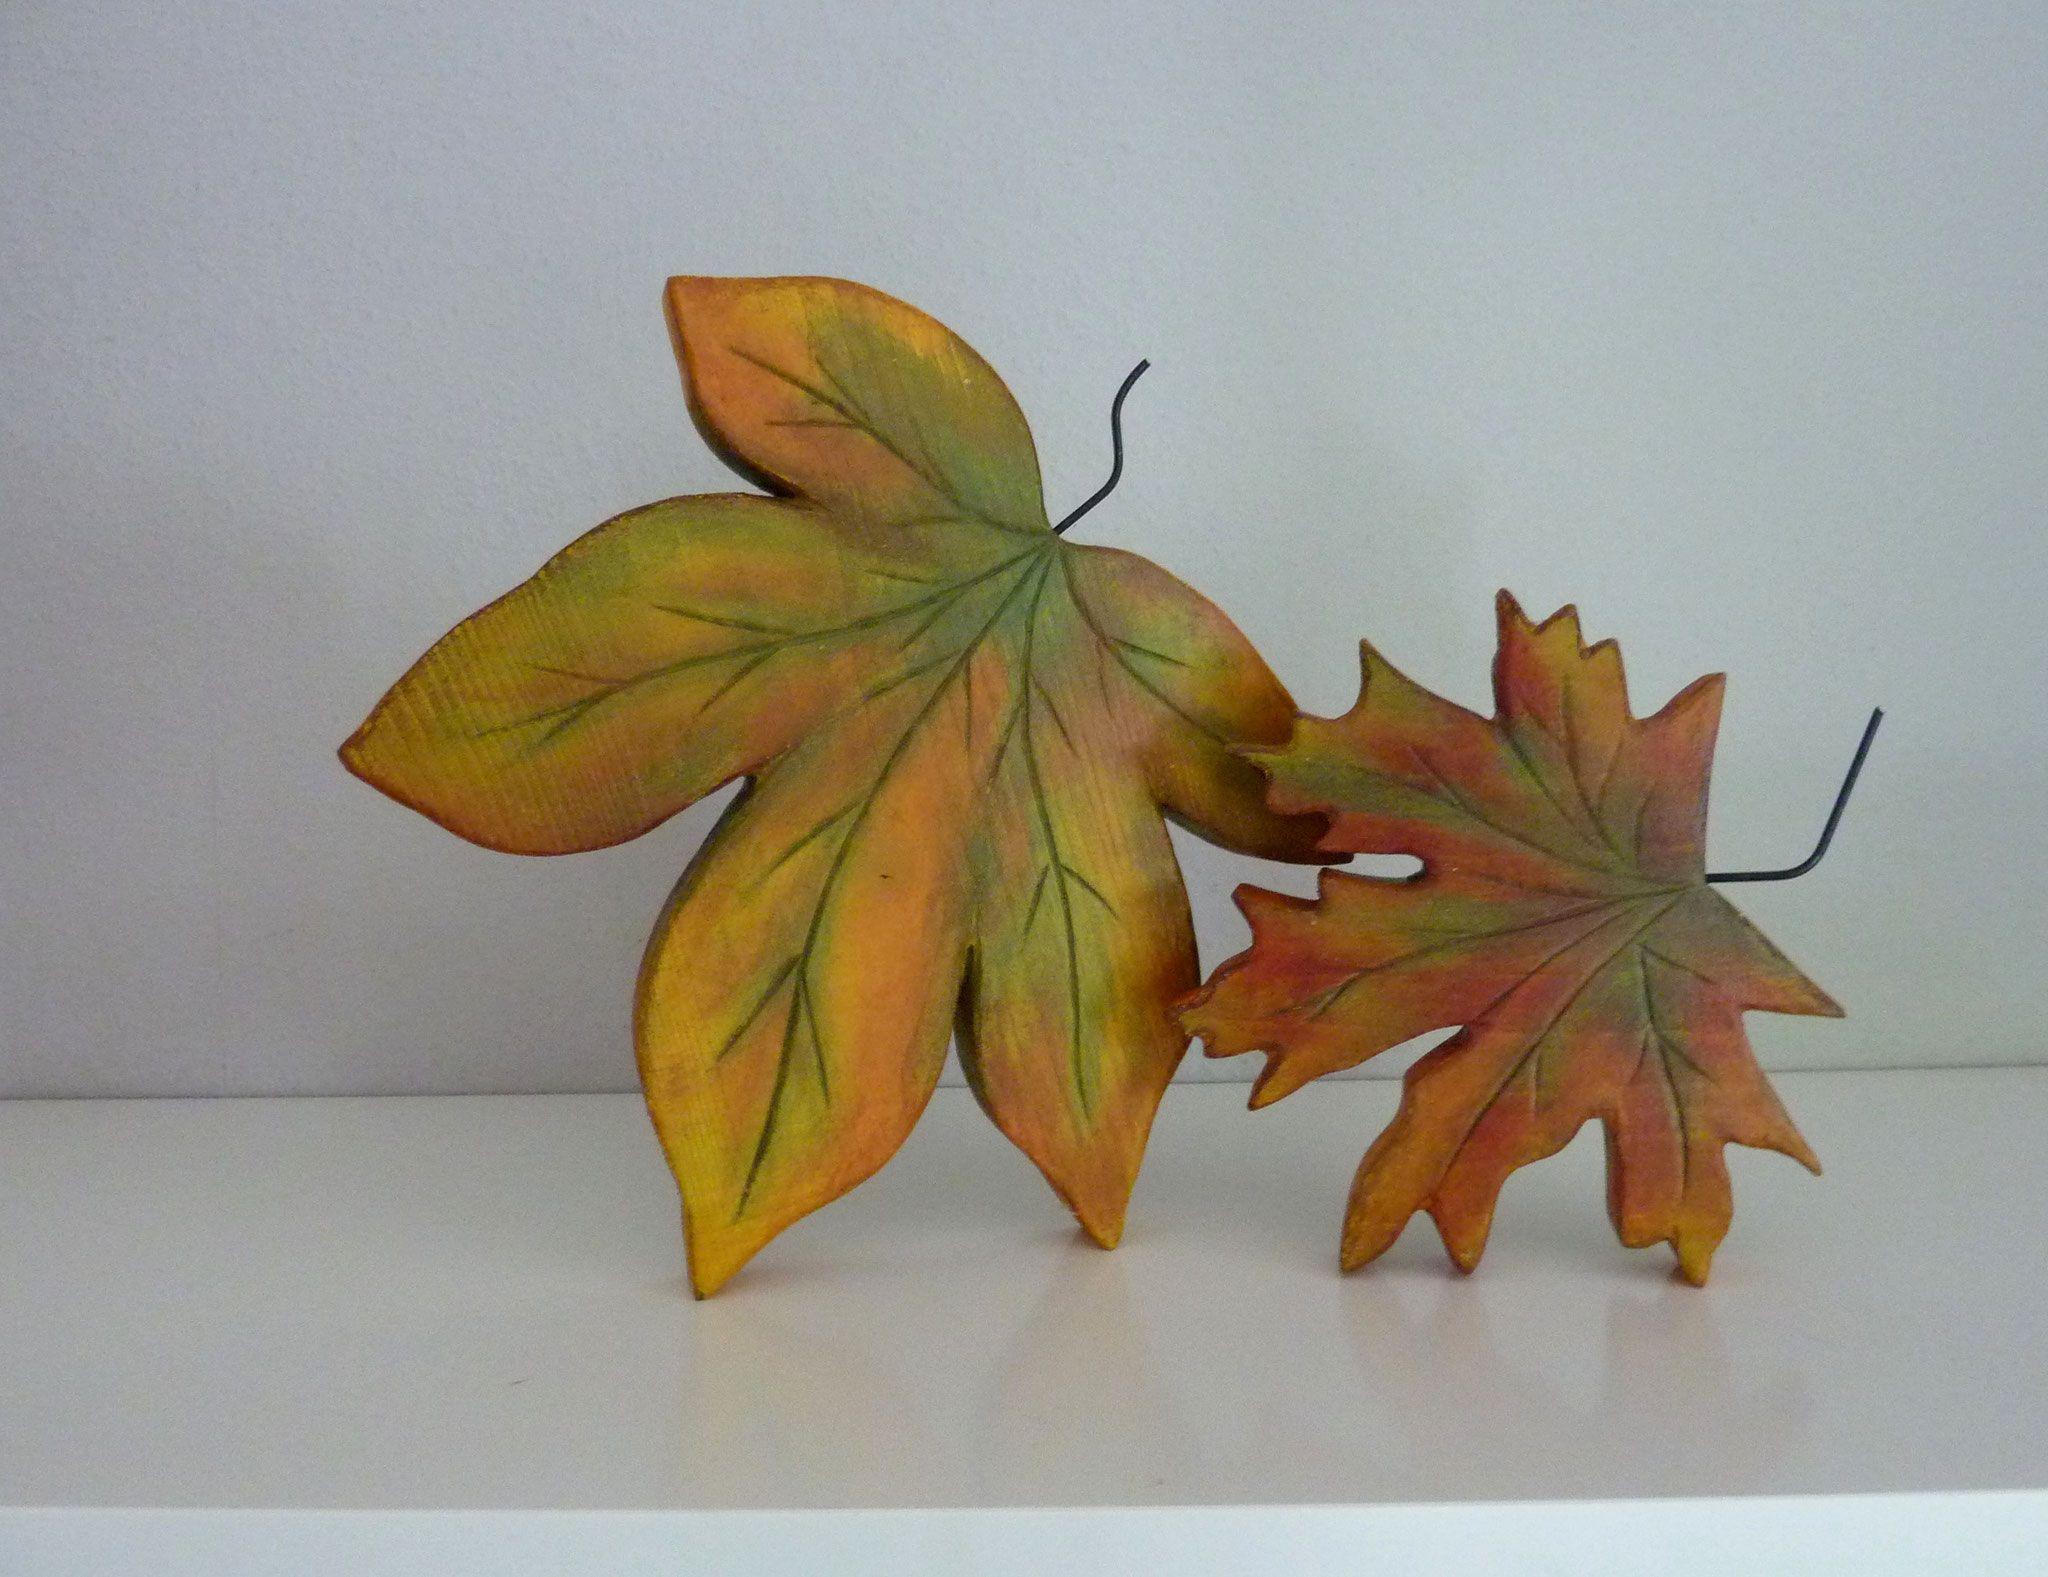 Herbstdeko Holz